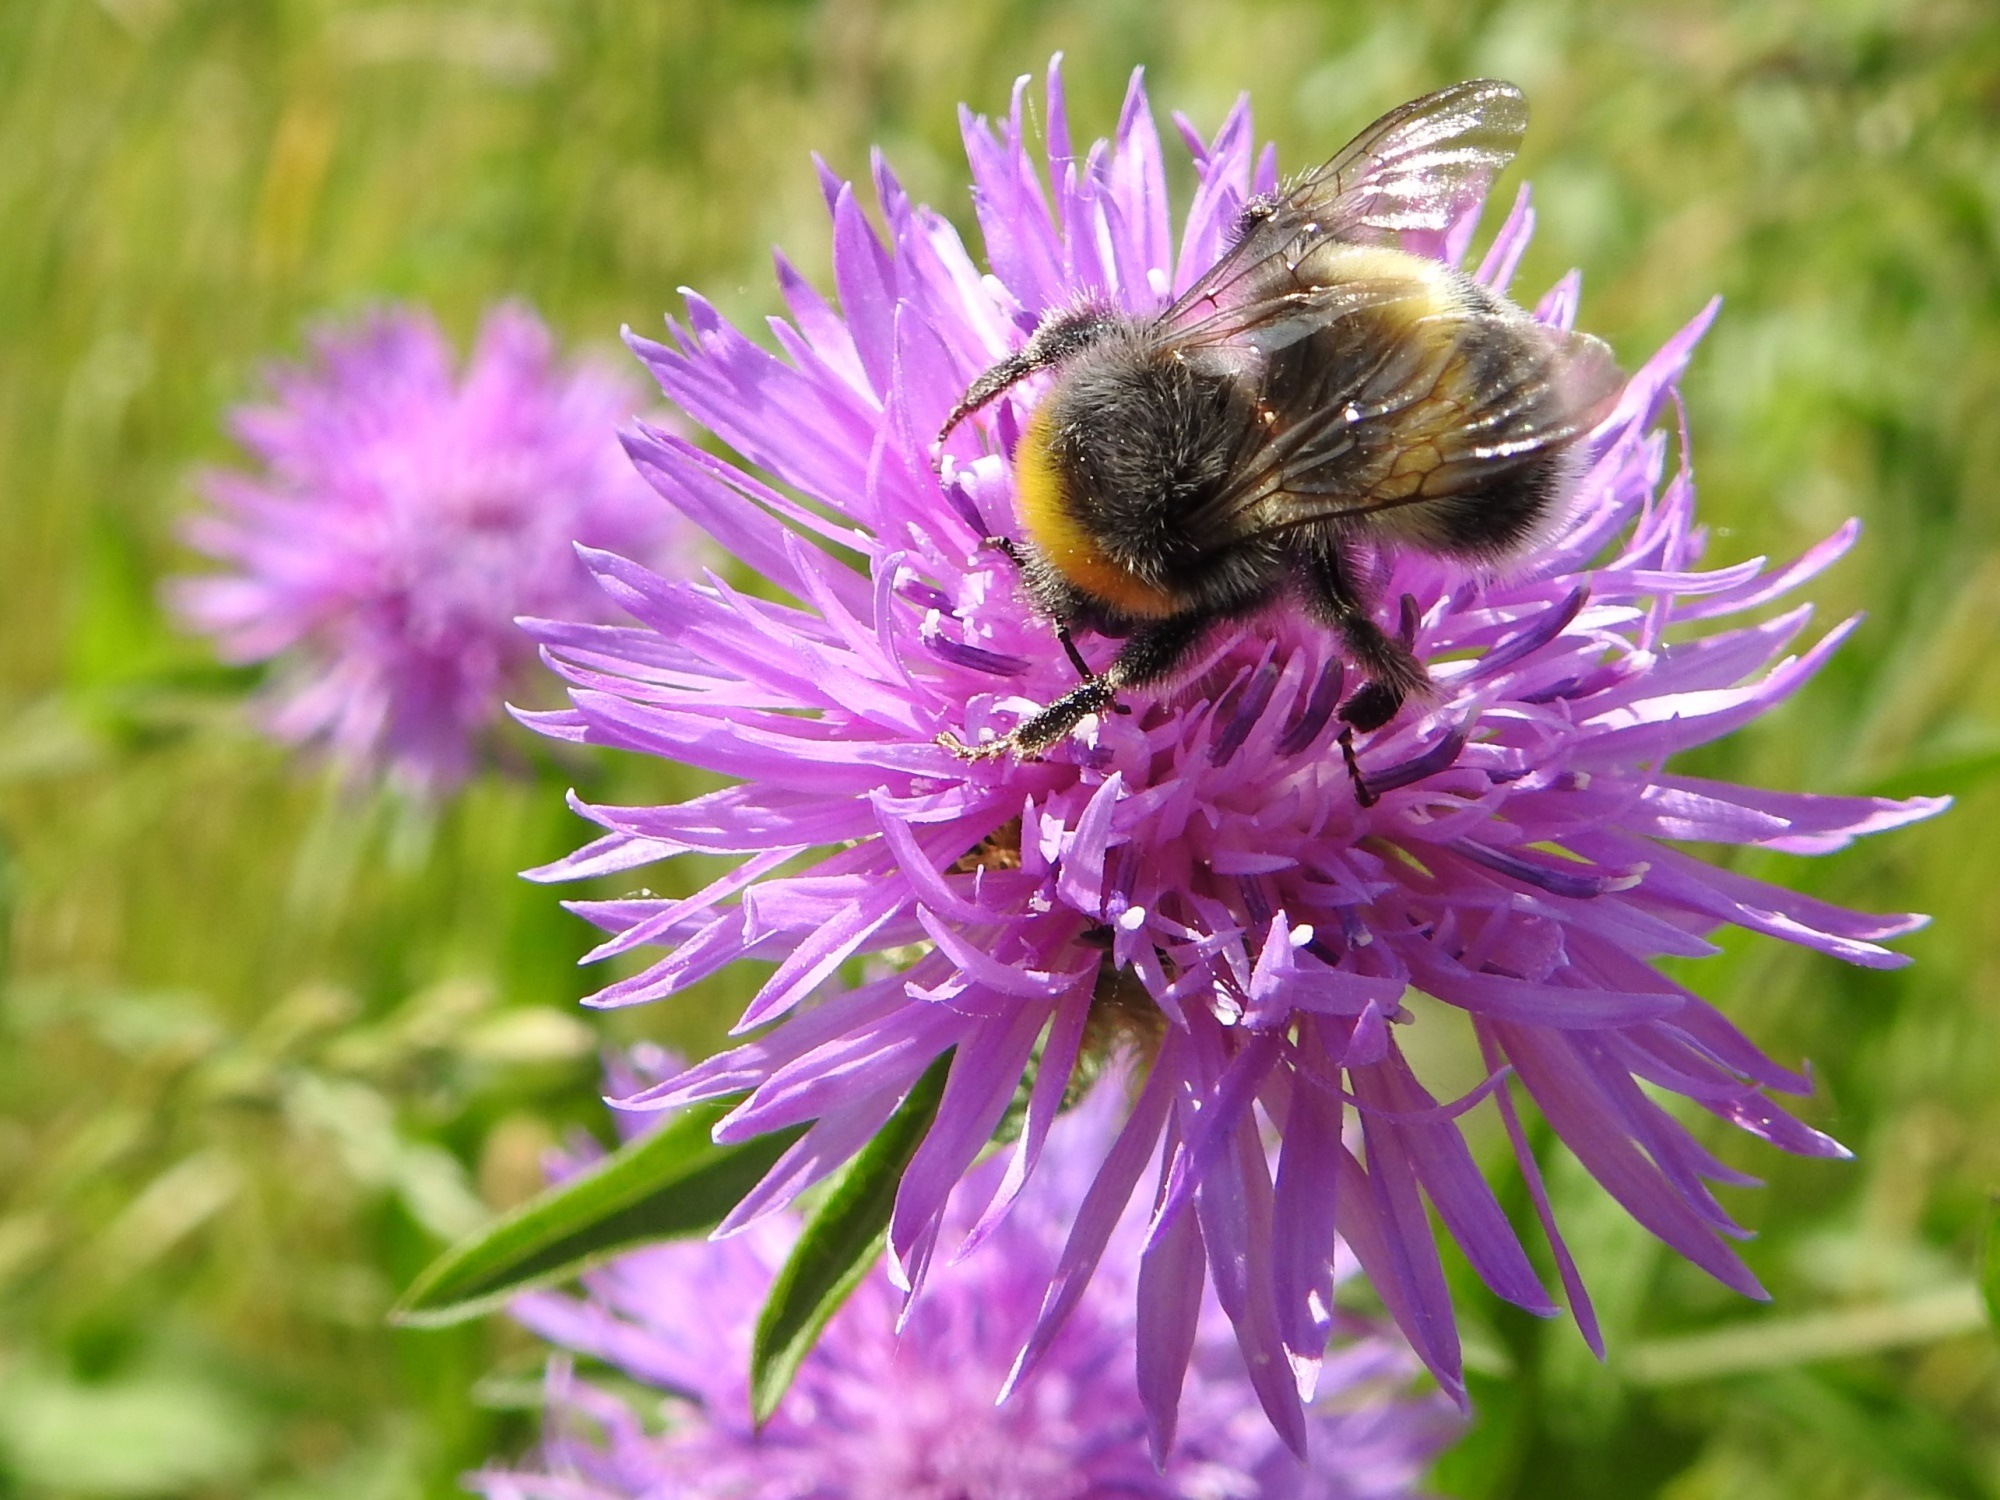 Buzy bumblebee by Fedor de Vries